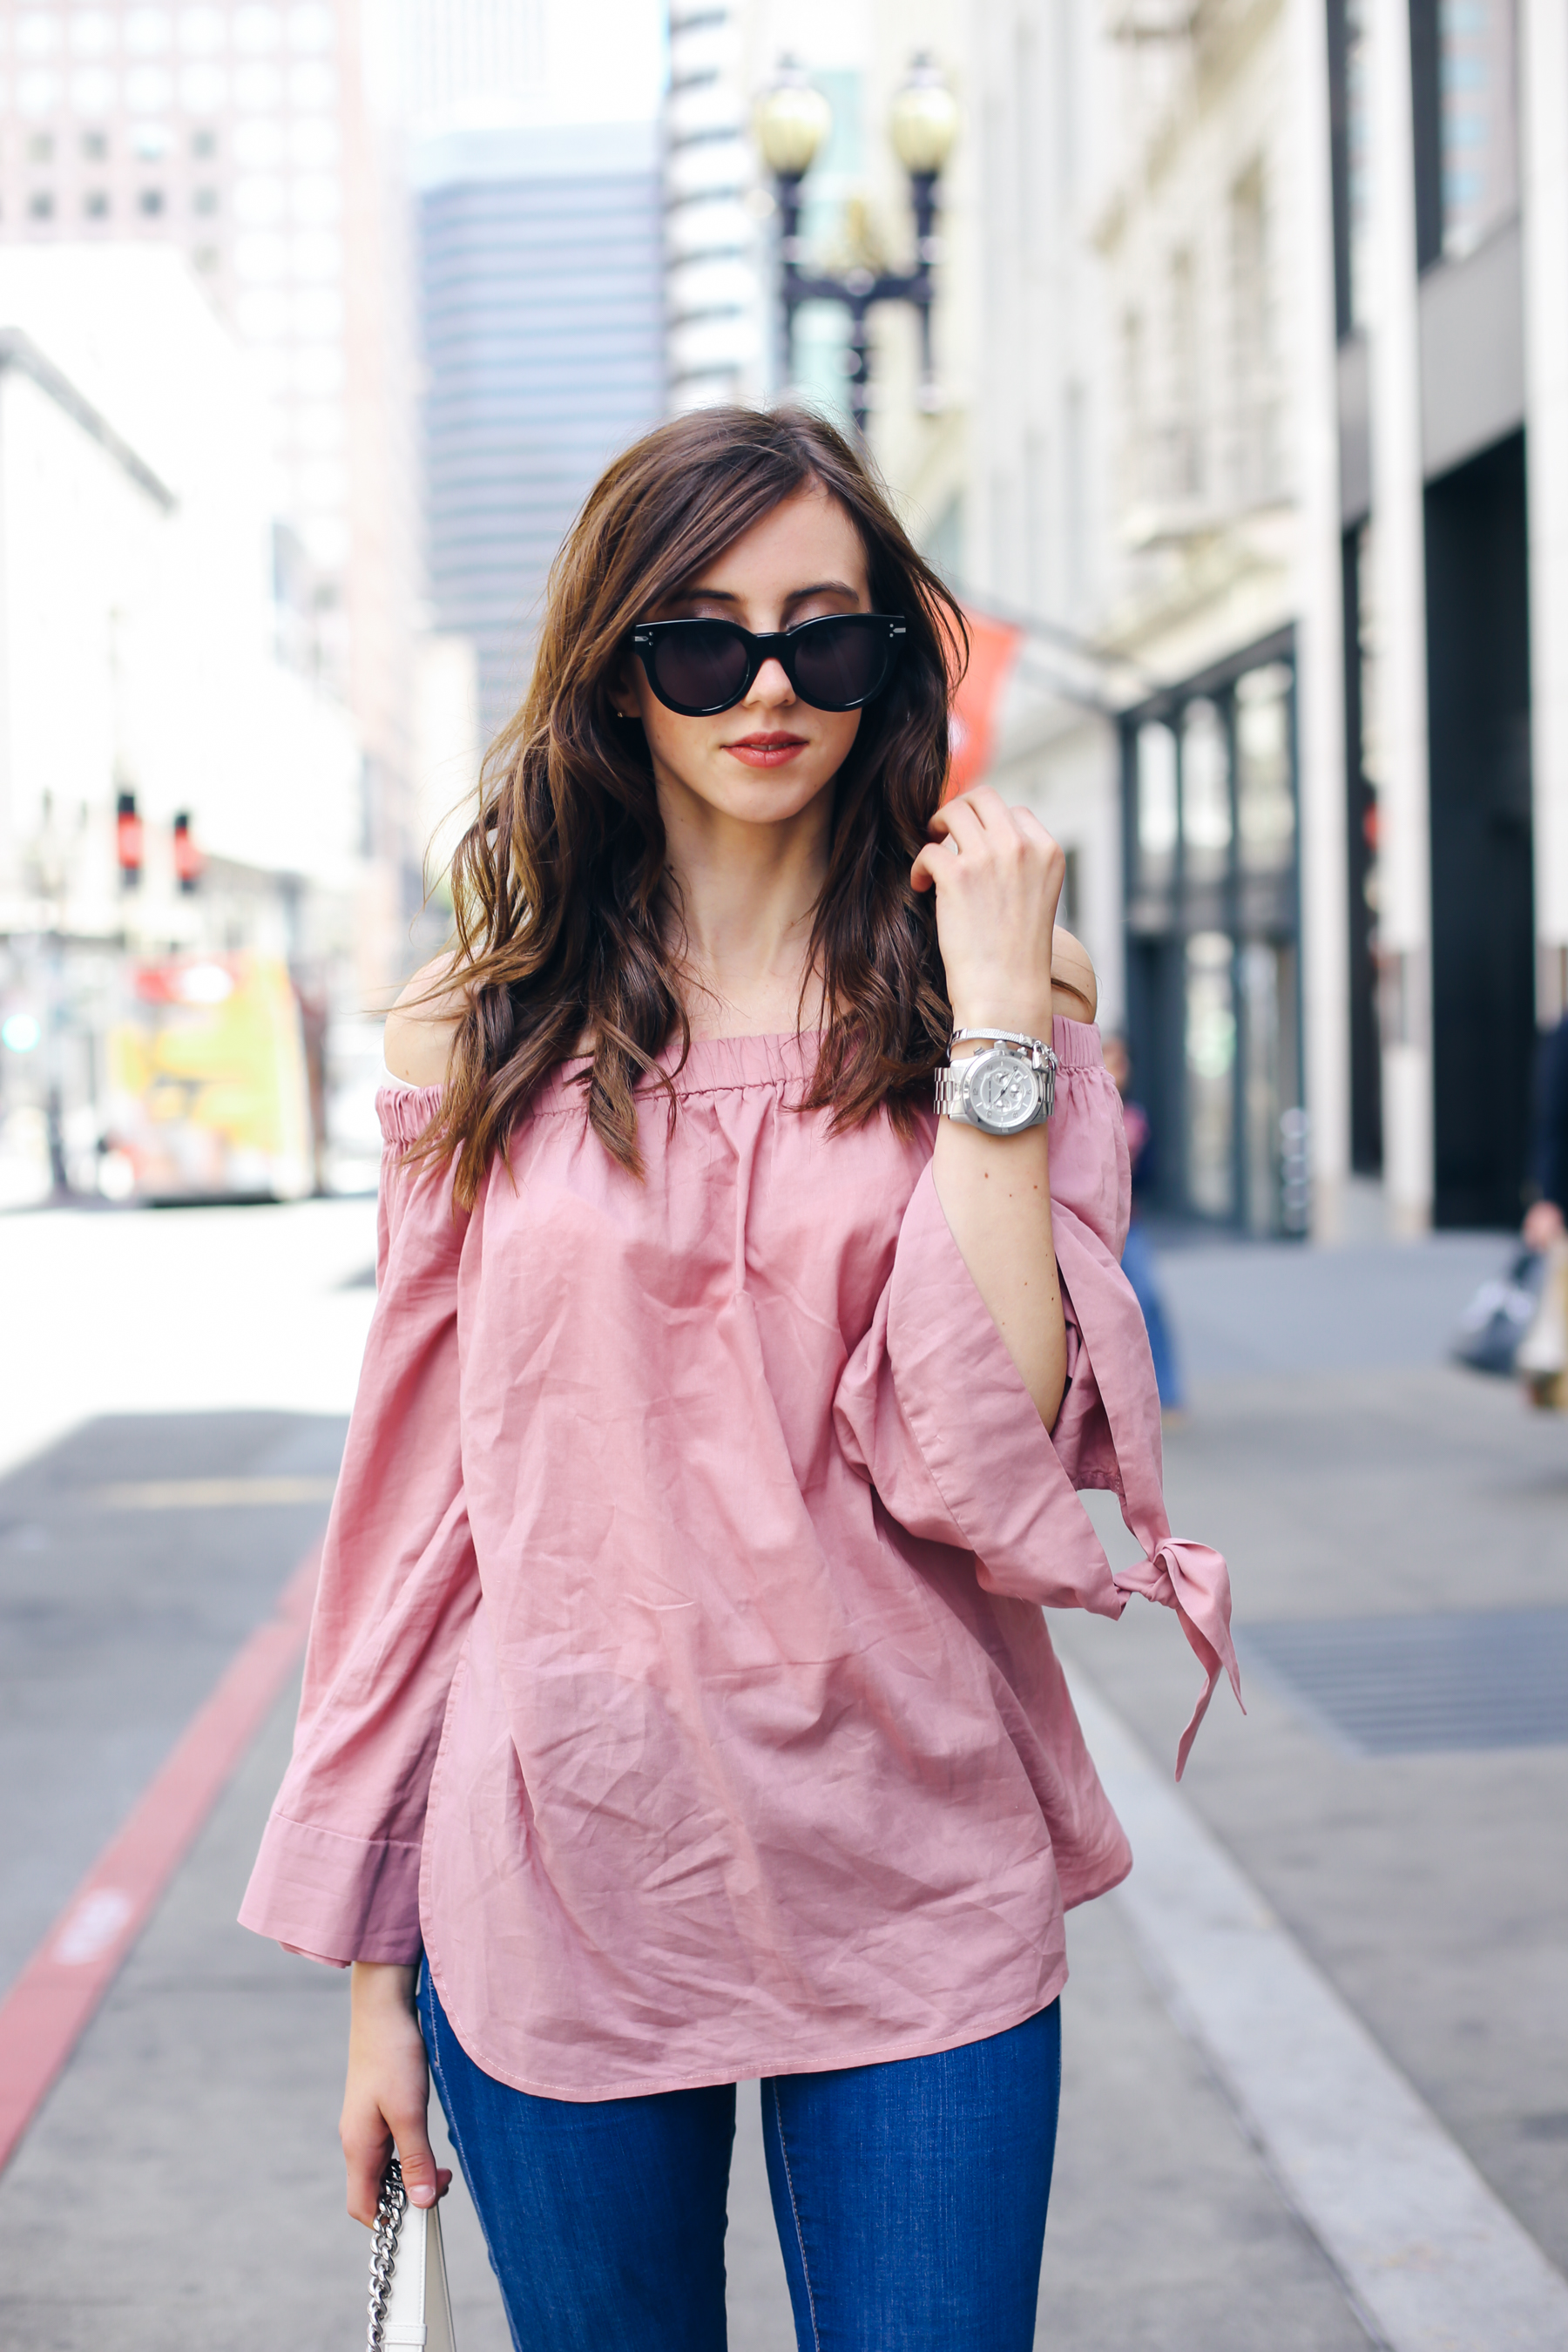 Barbora-Ondracova-FashioninmySoul-Fashion-Blogger-Photography-RyanbyRyanChua-7185